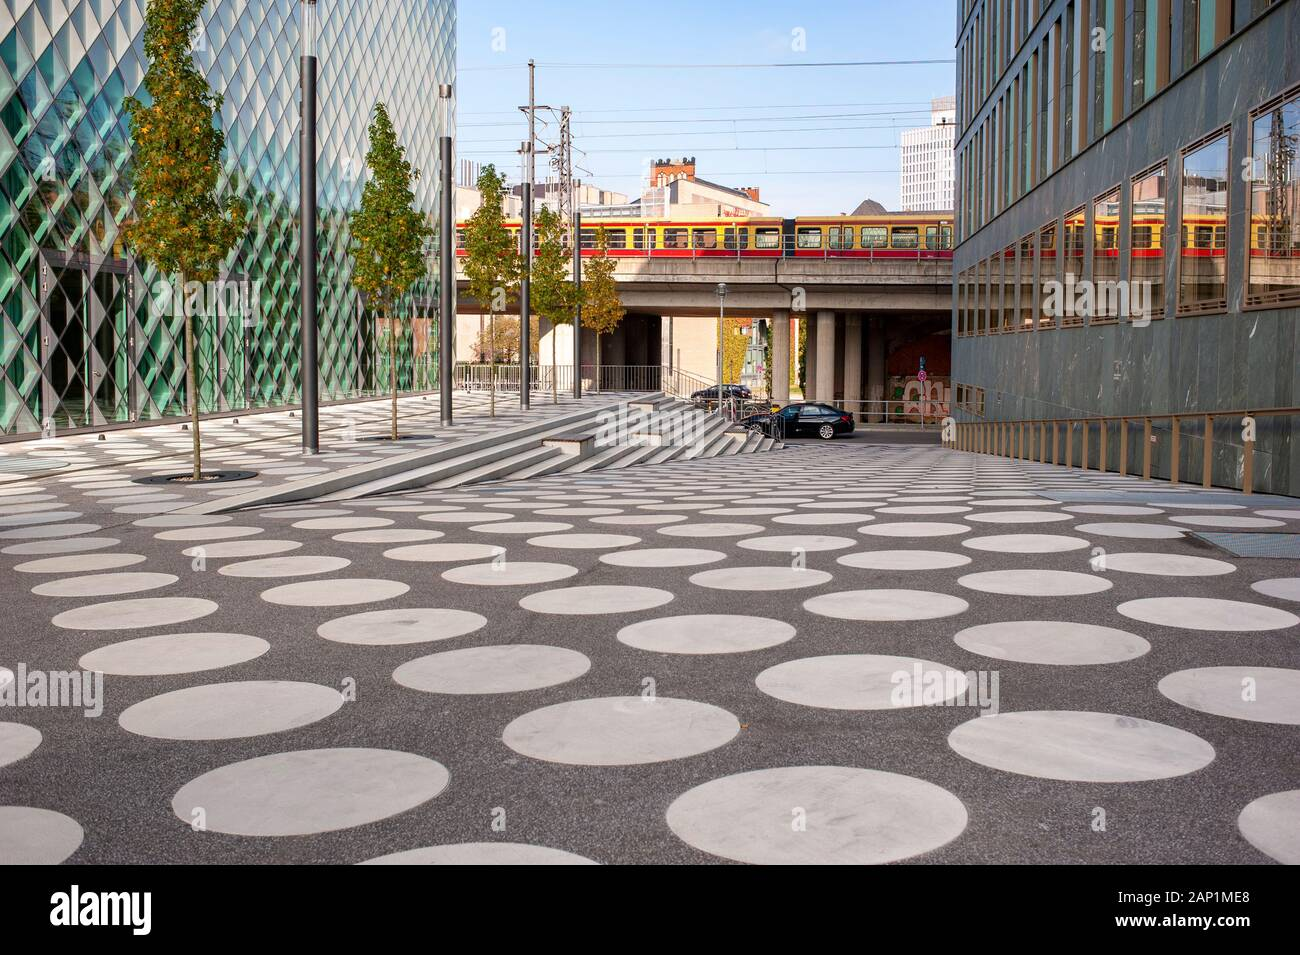 Futurium museum adjacent lane with train passing by. Berlin stock travel photographs. Stock Photo